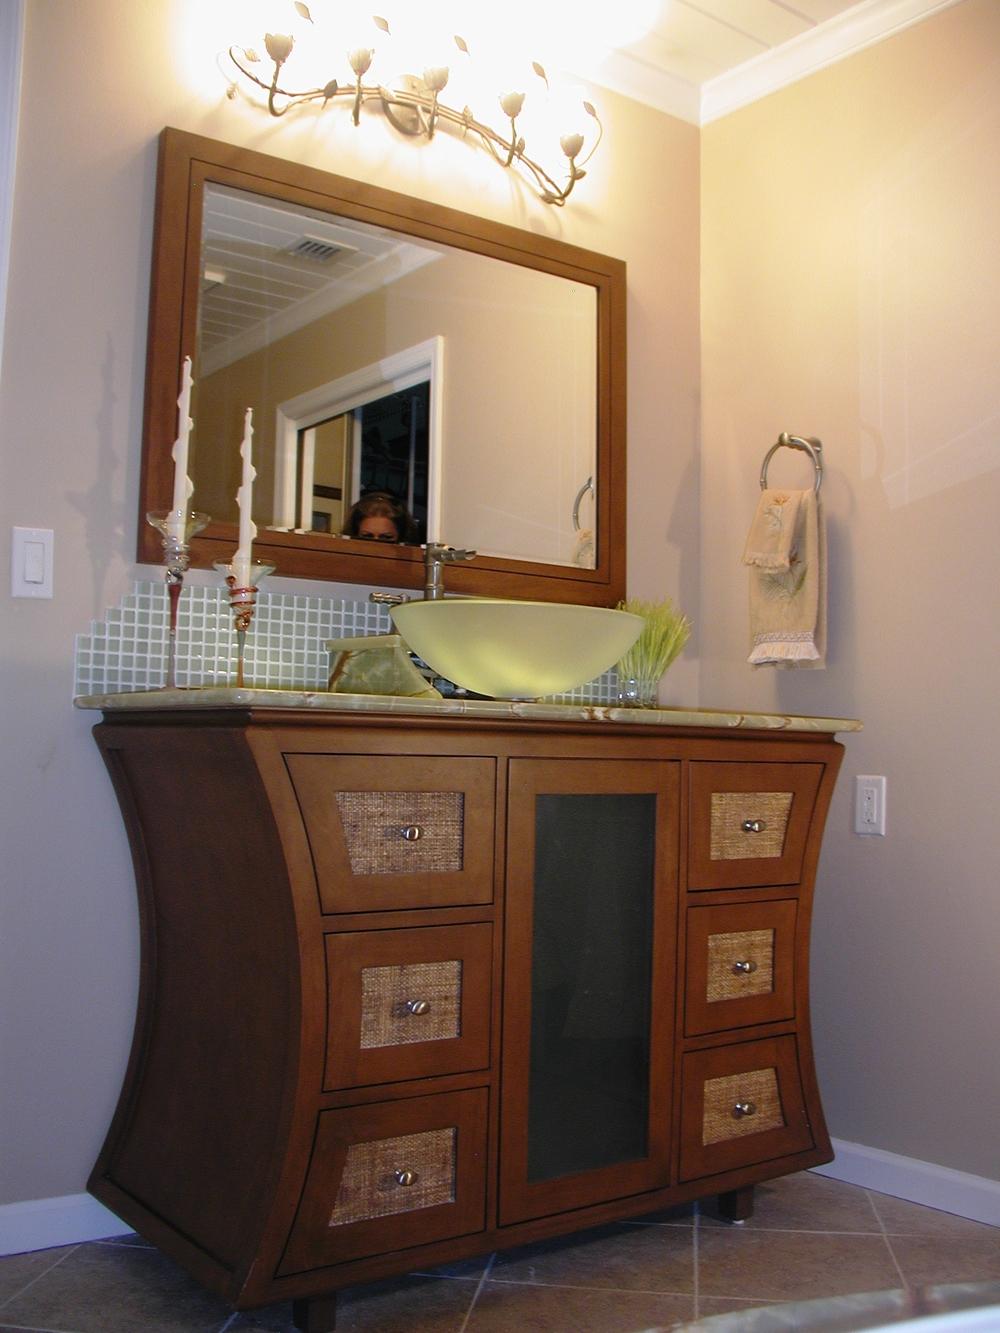 Zuba Hse 1 M Bath Vanity 1.JPG